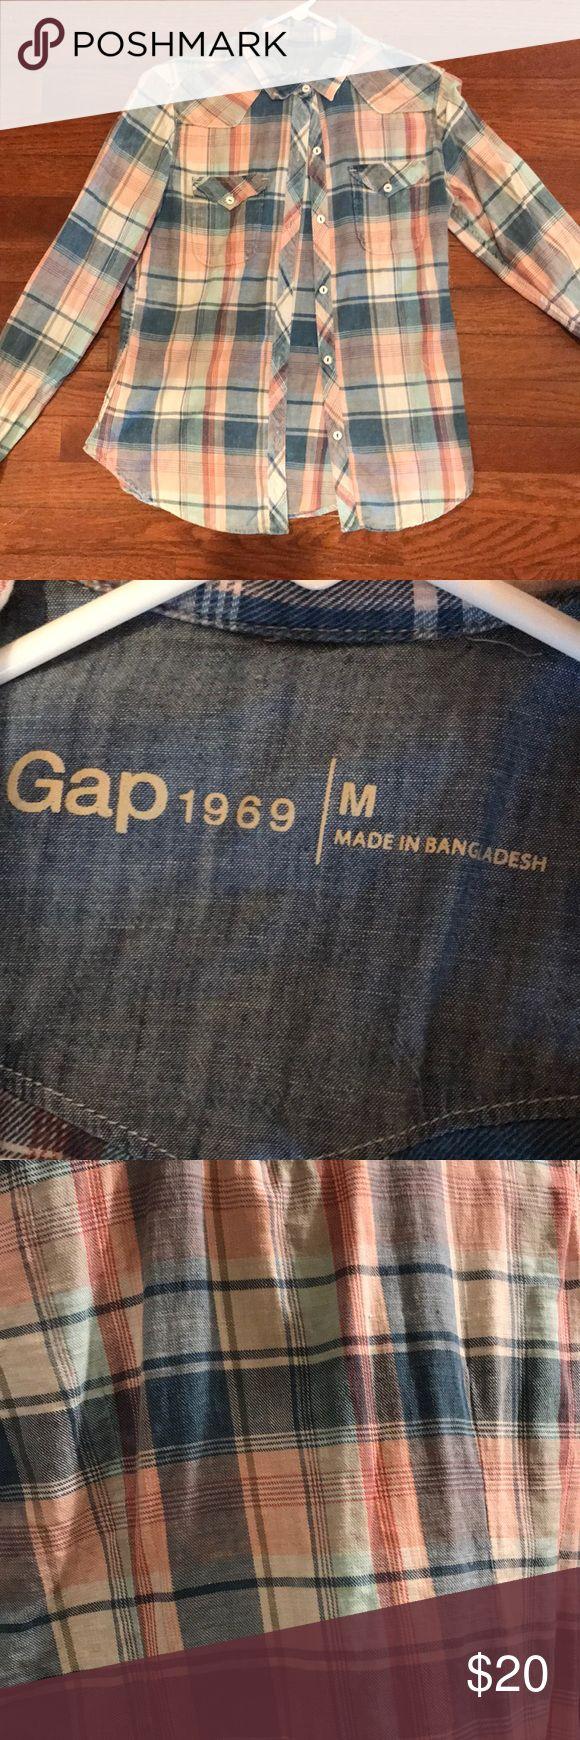 Plaid flannel longsleeved shirt Gap 1969 medium ladies long sleeved plaid flannel shirt GAP Tops Button Down Shirts